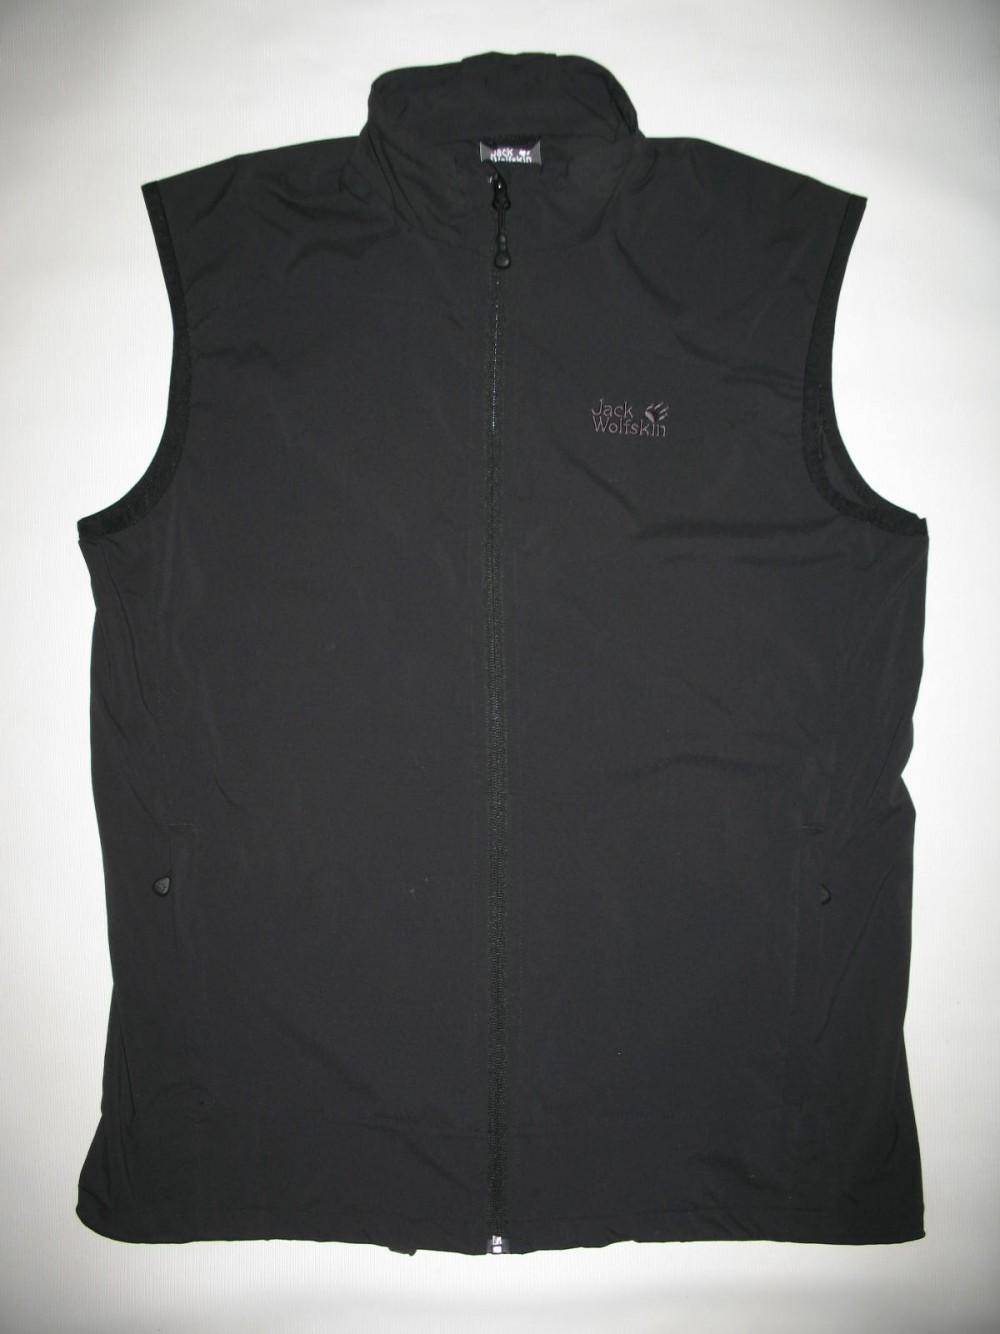 Жилет JACK WOLFSKIN activate softshell vest (размер XL) - 1